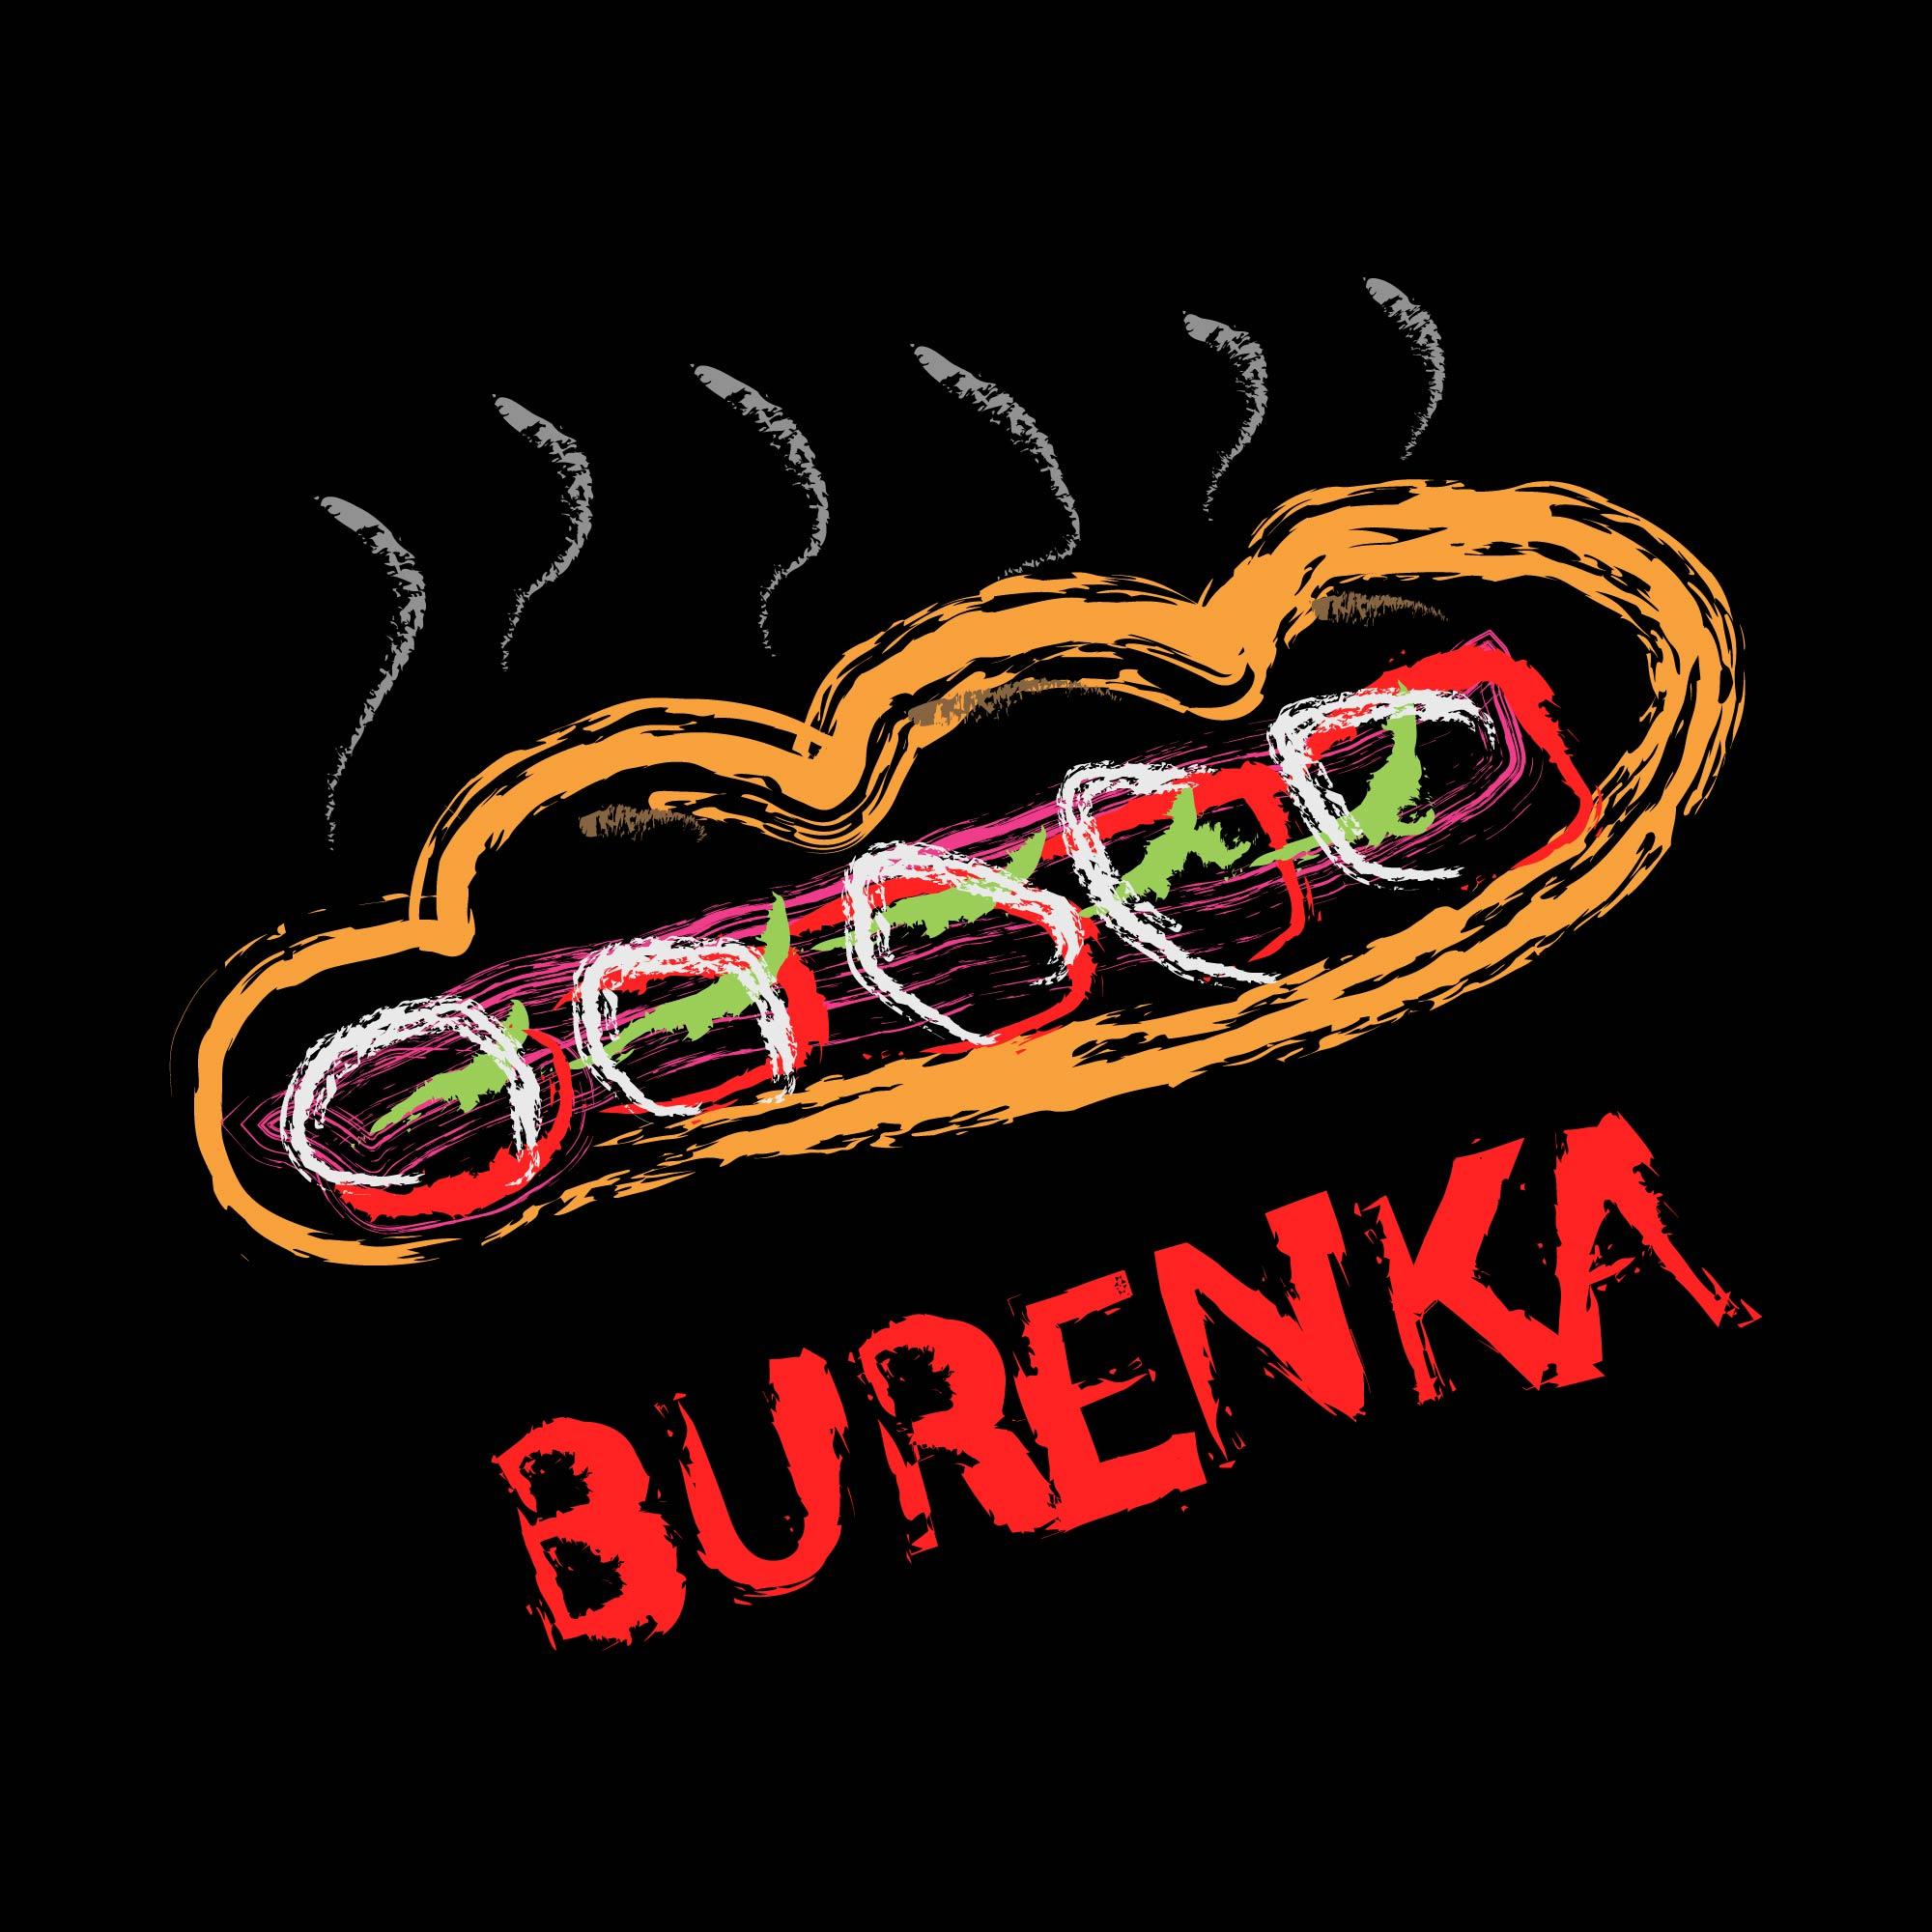 Логотип для Бургерной с Пекарней фото f_3465e13789452554.jpg